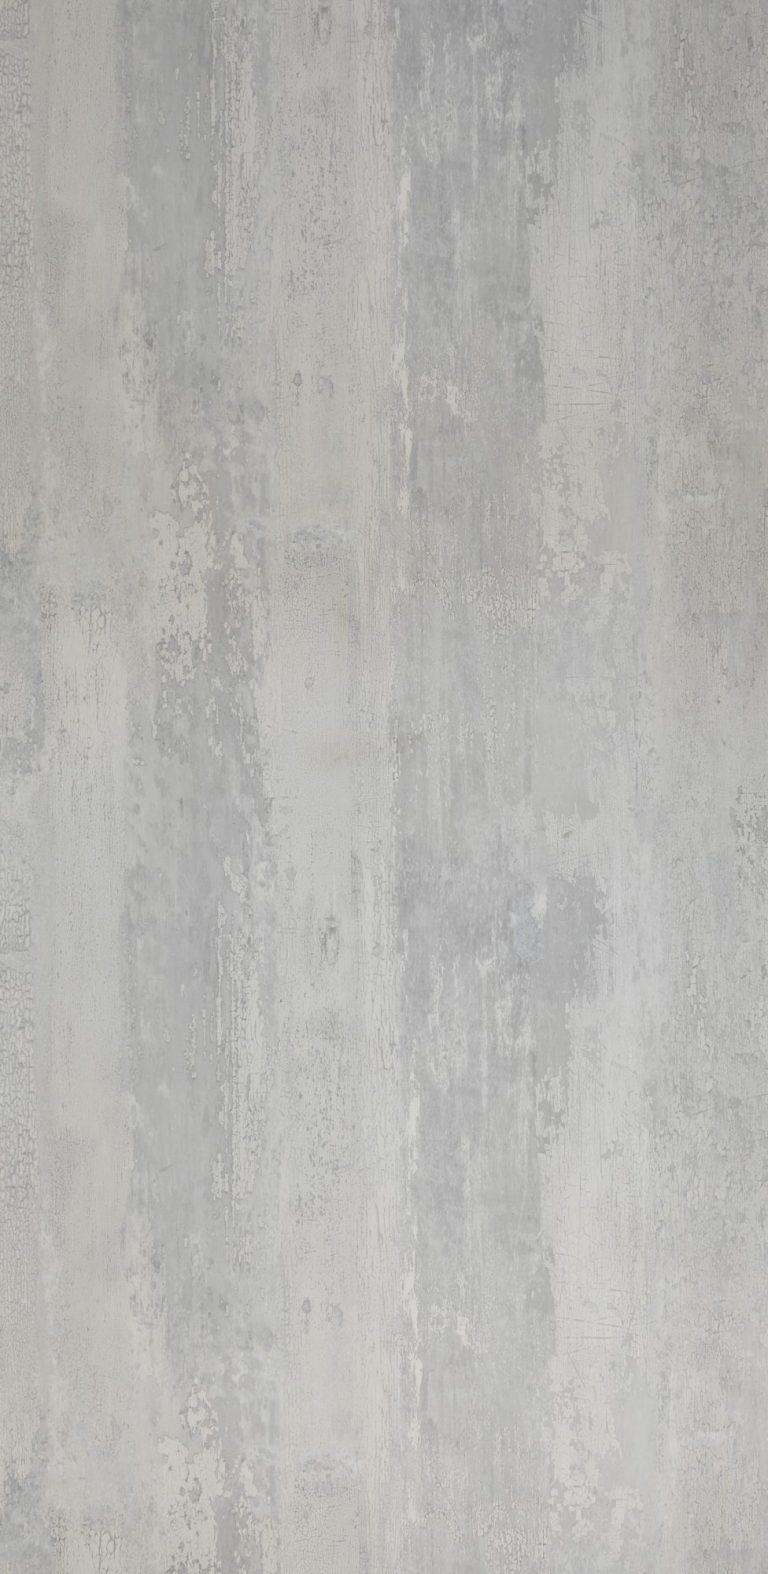 HPL Specials - Ash White